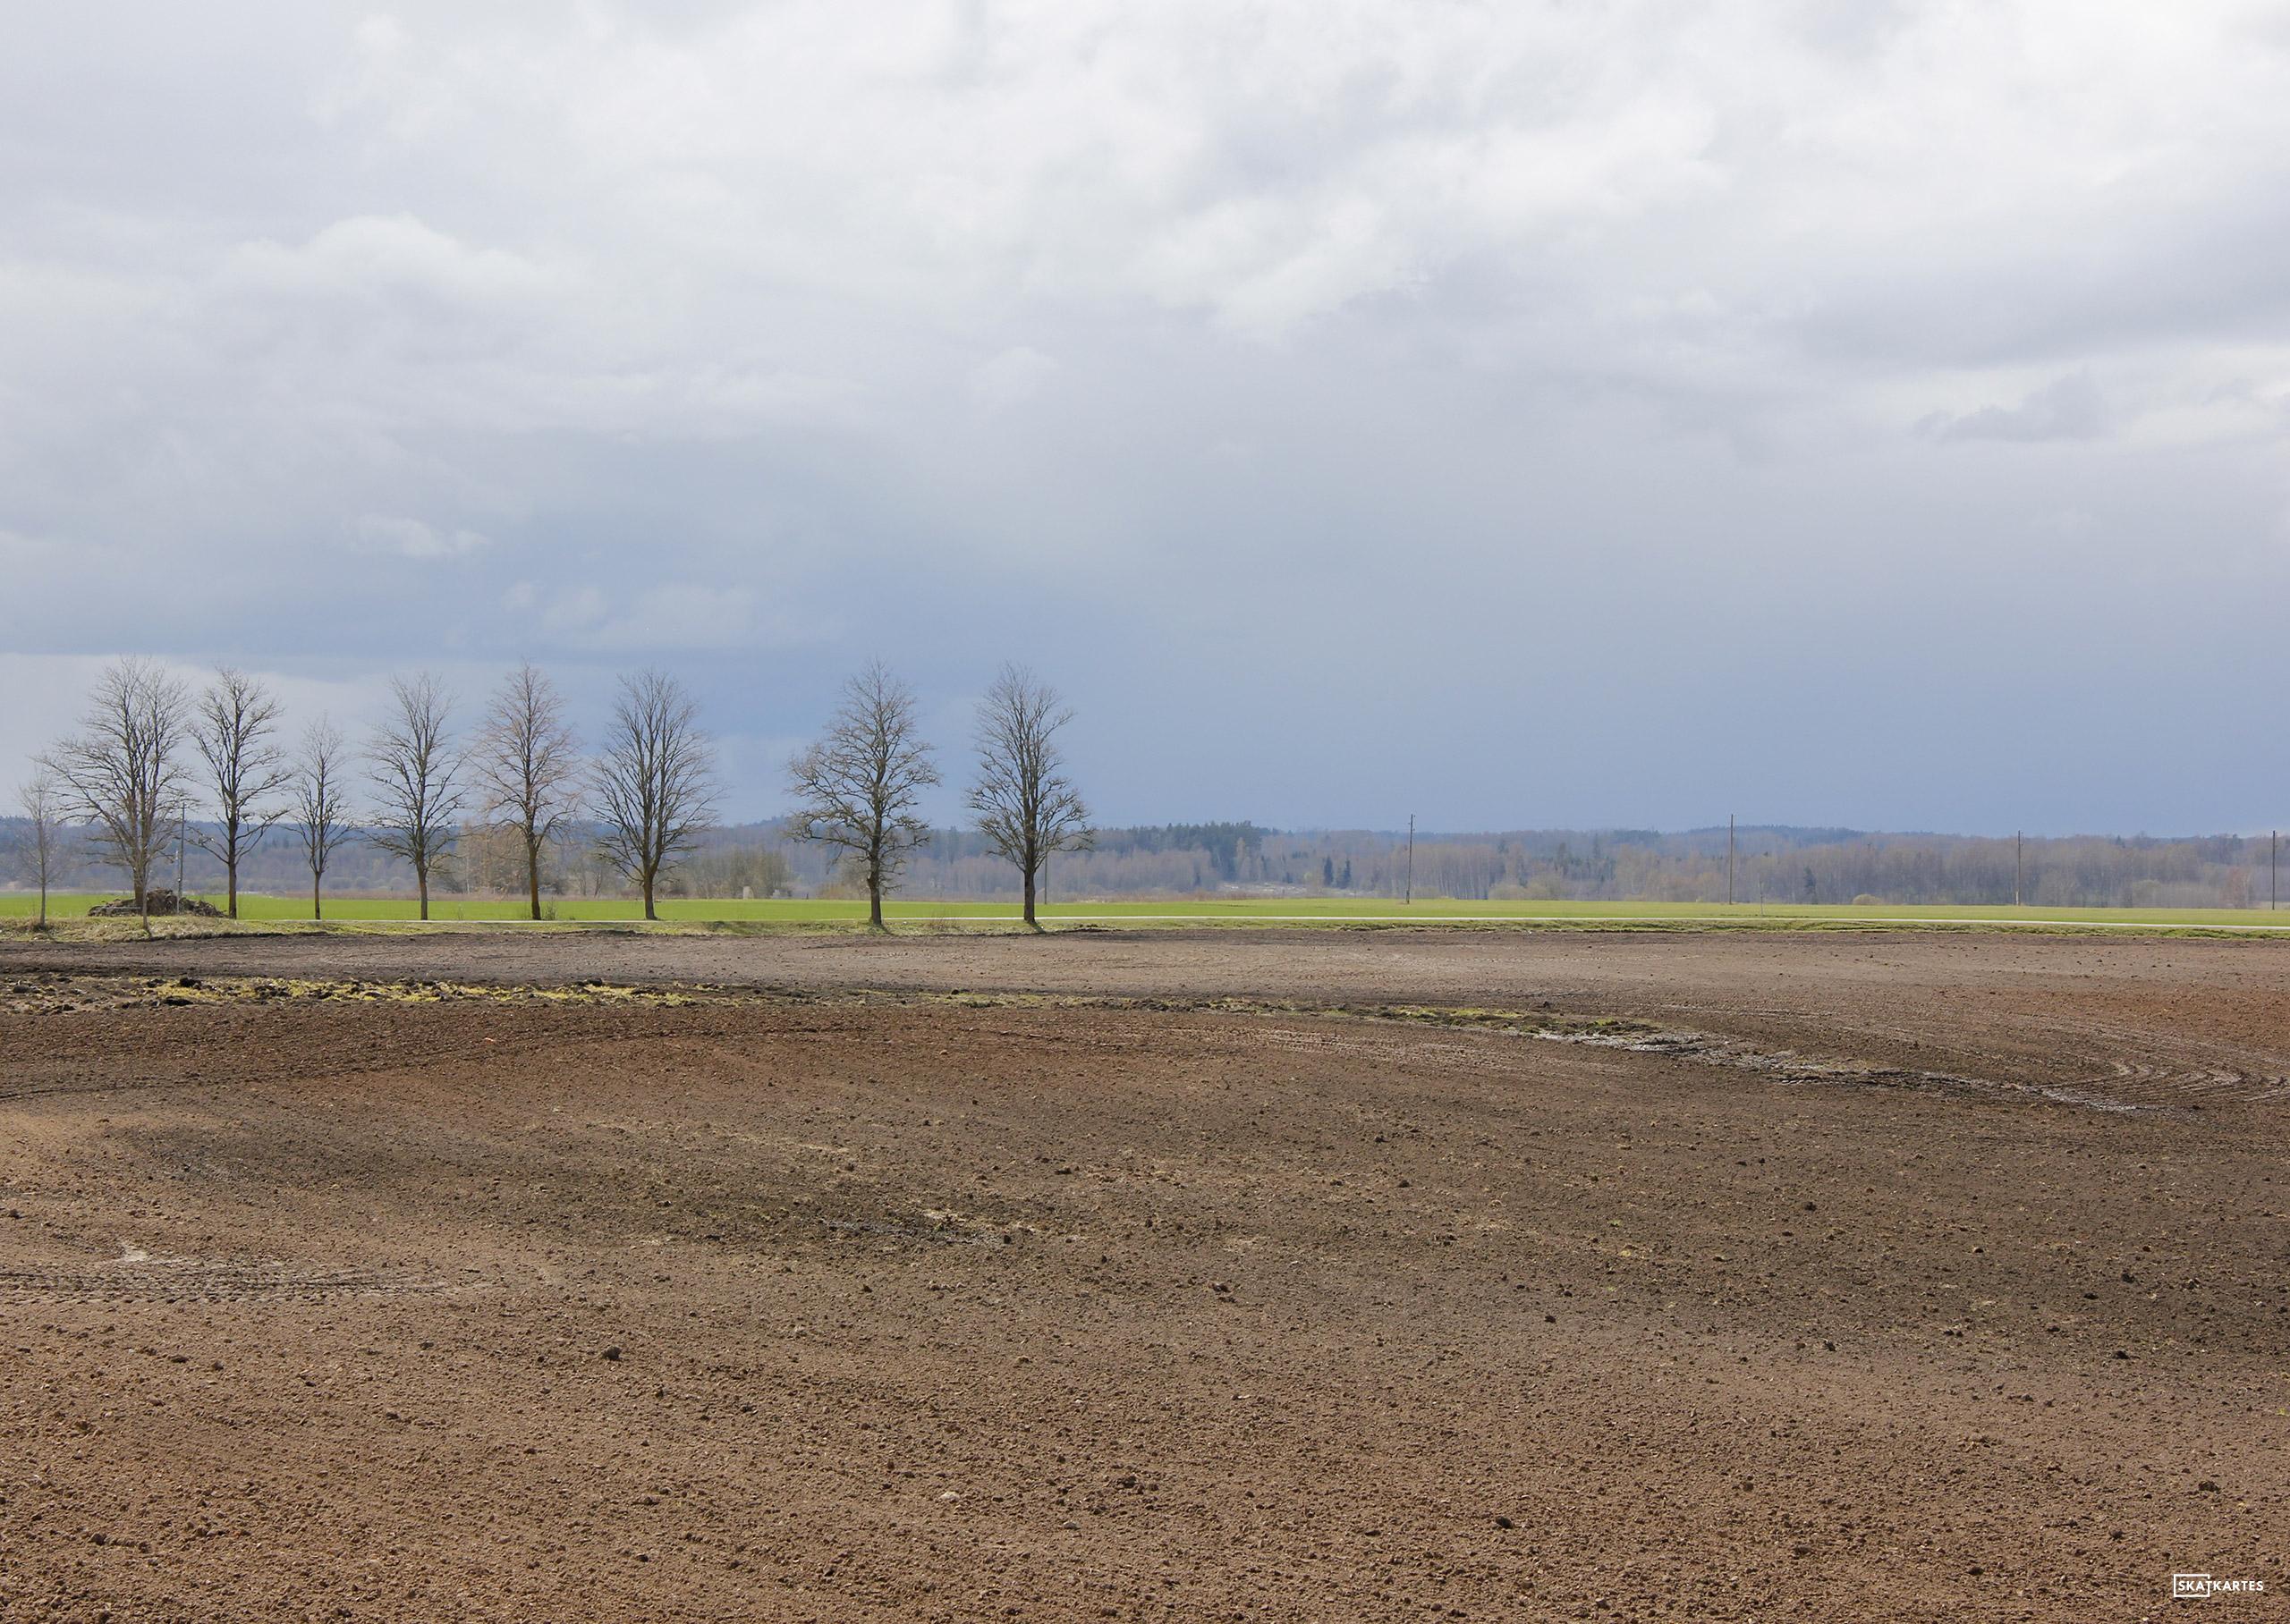 Skatkarte Nr. 1113 - Dabas ainava no P104 lielceļa (2016. gada pavasaris).